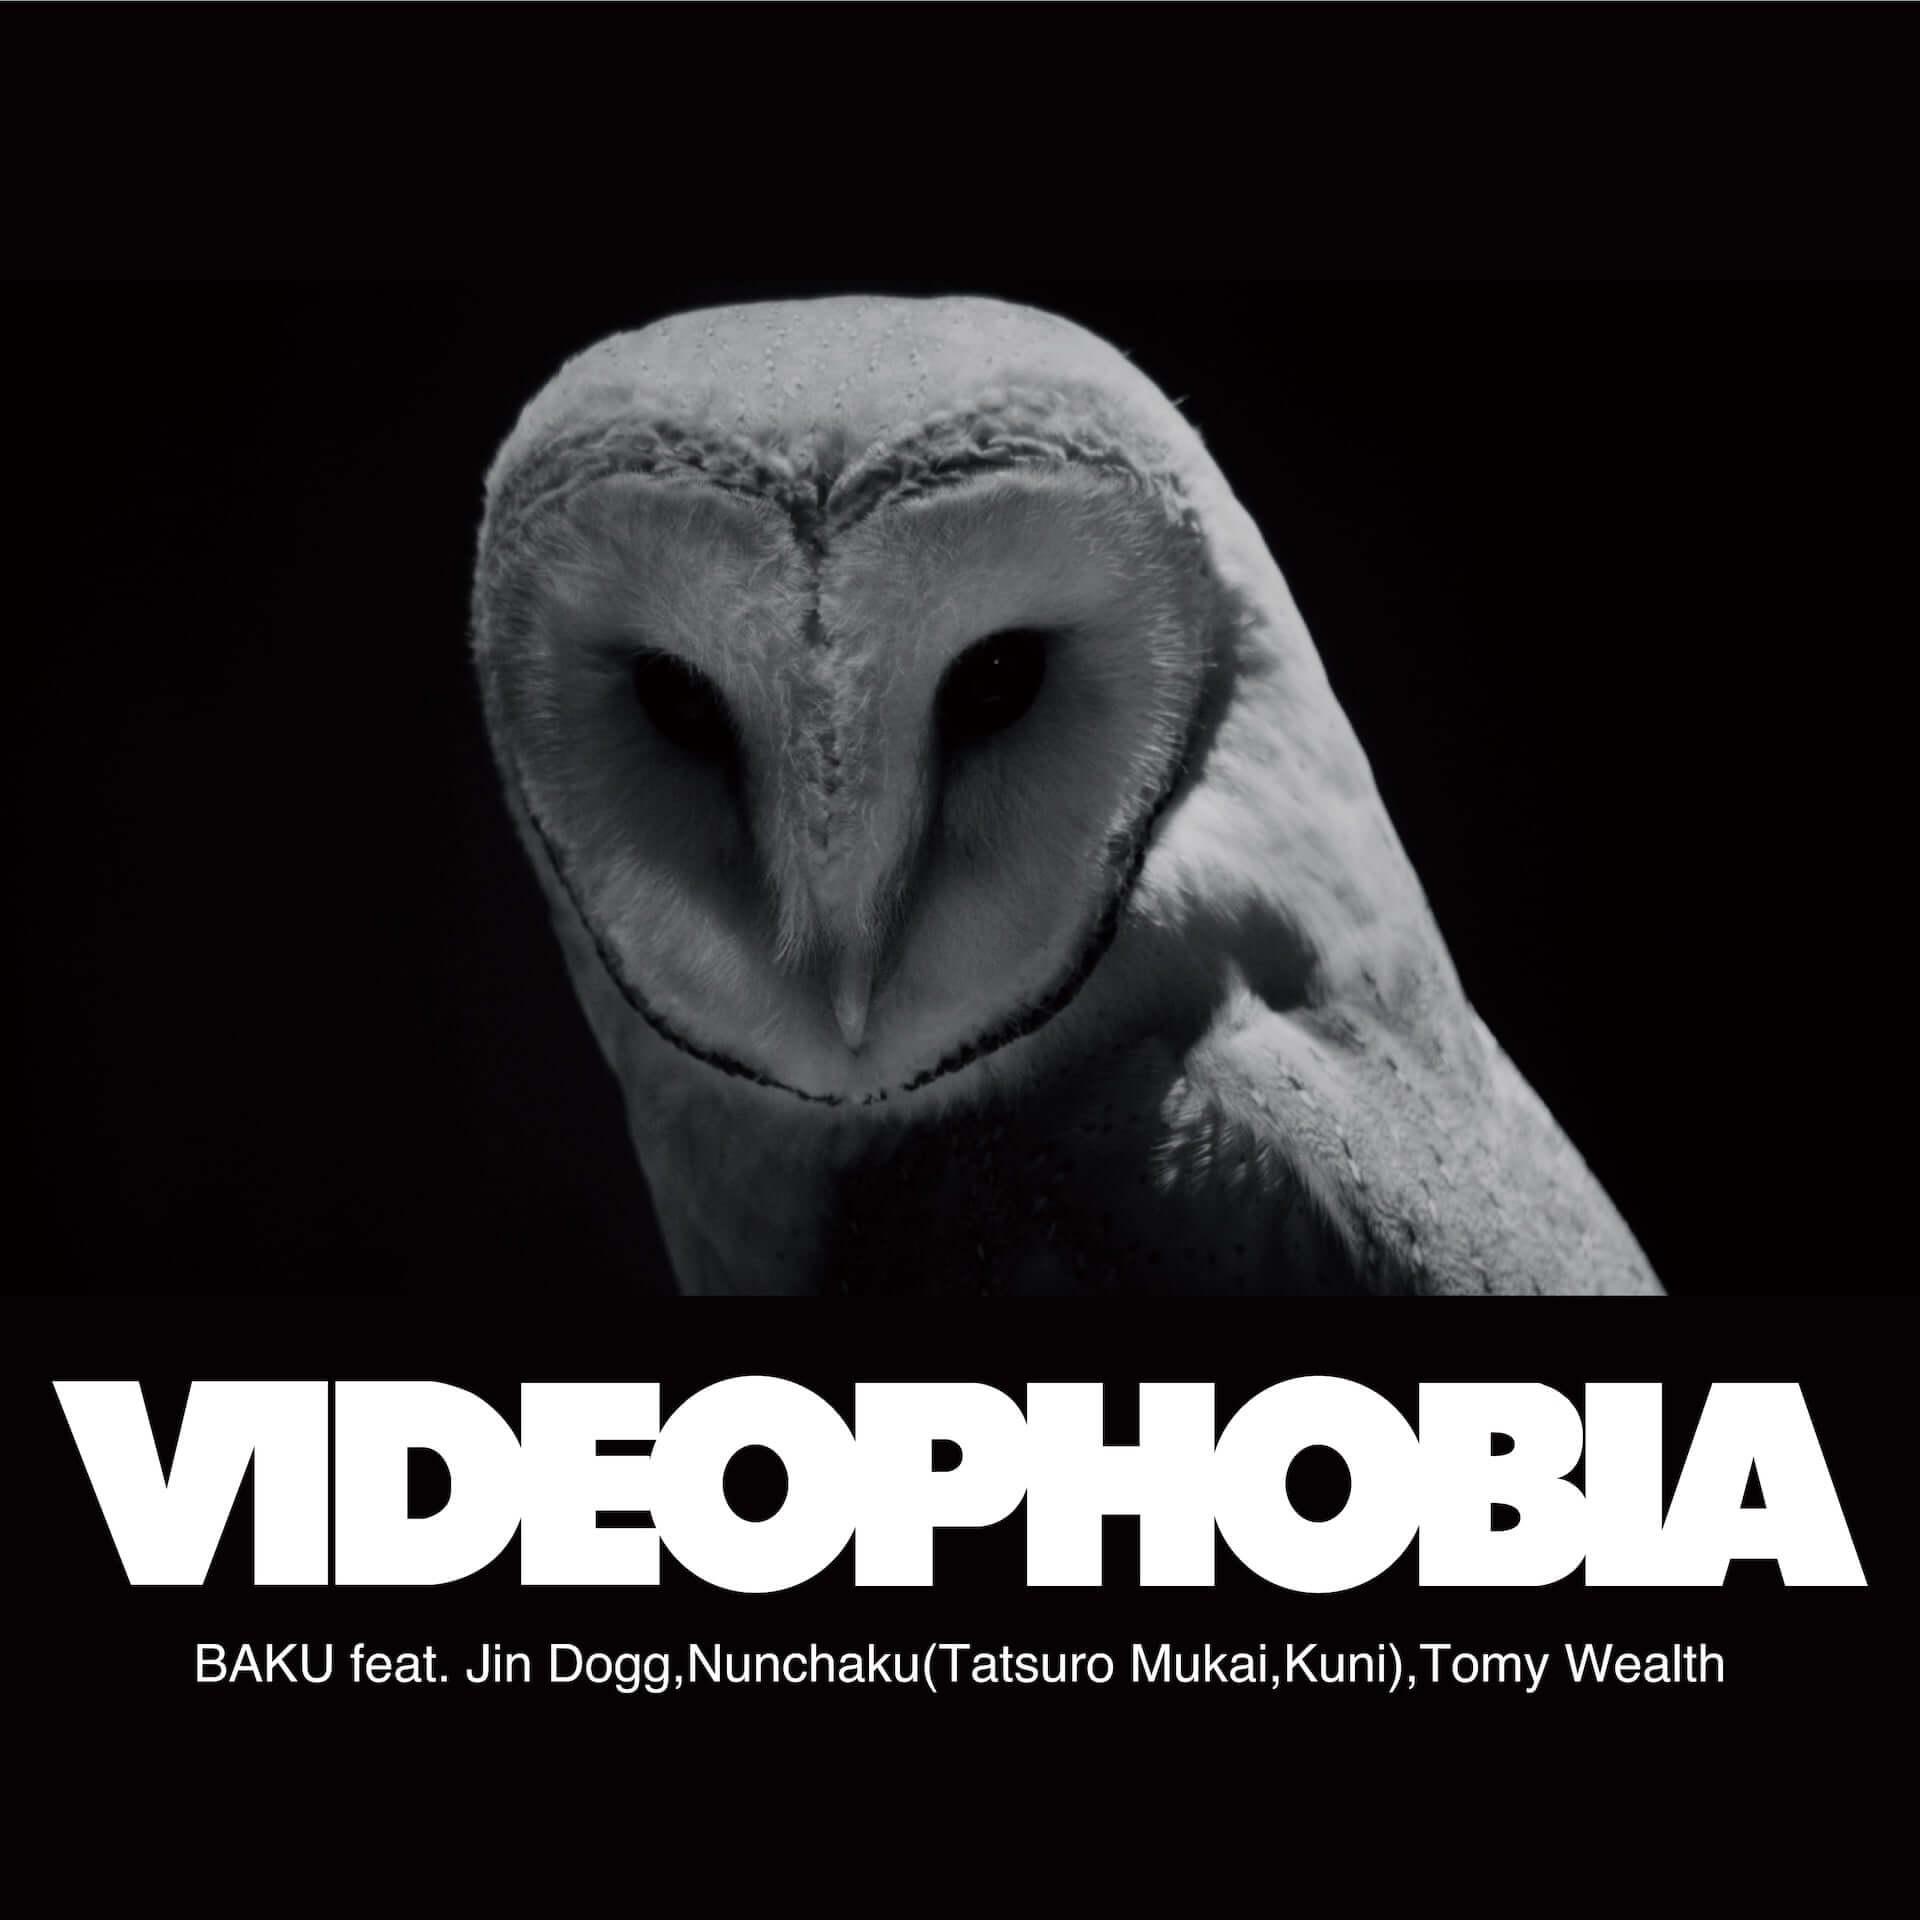 DJ BAKUが映画『VIDEOPHOBIA』のEDテーマ曲をリリース!Jin Dogg、Tomy Wealth、ヌンチャクをフィーチャー music200916_baku_5-1920x1920